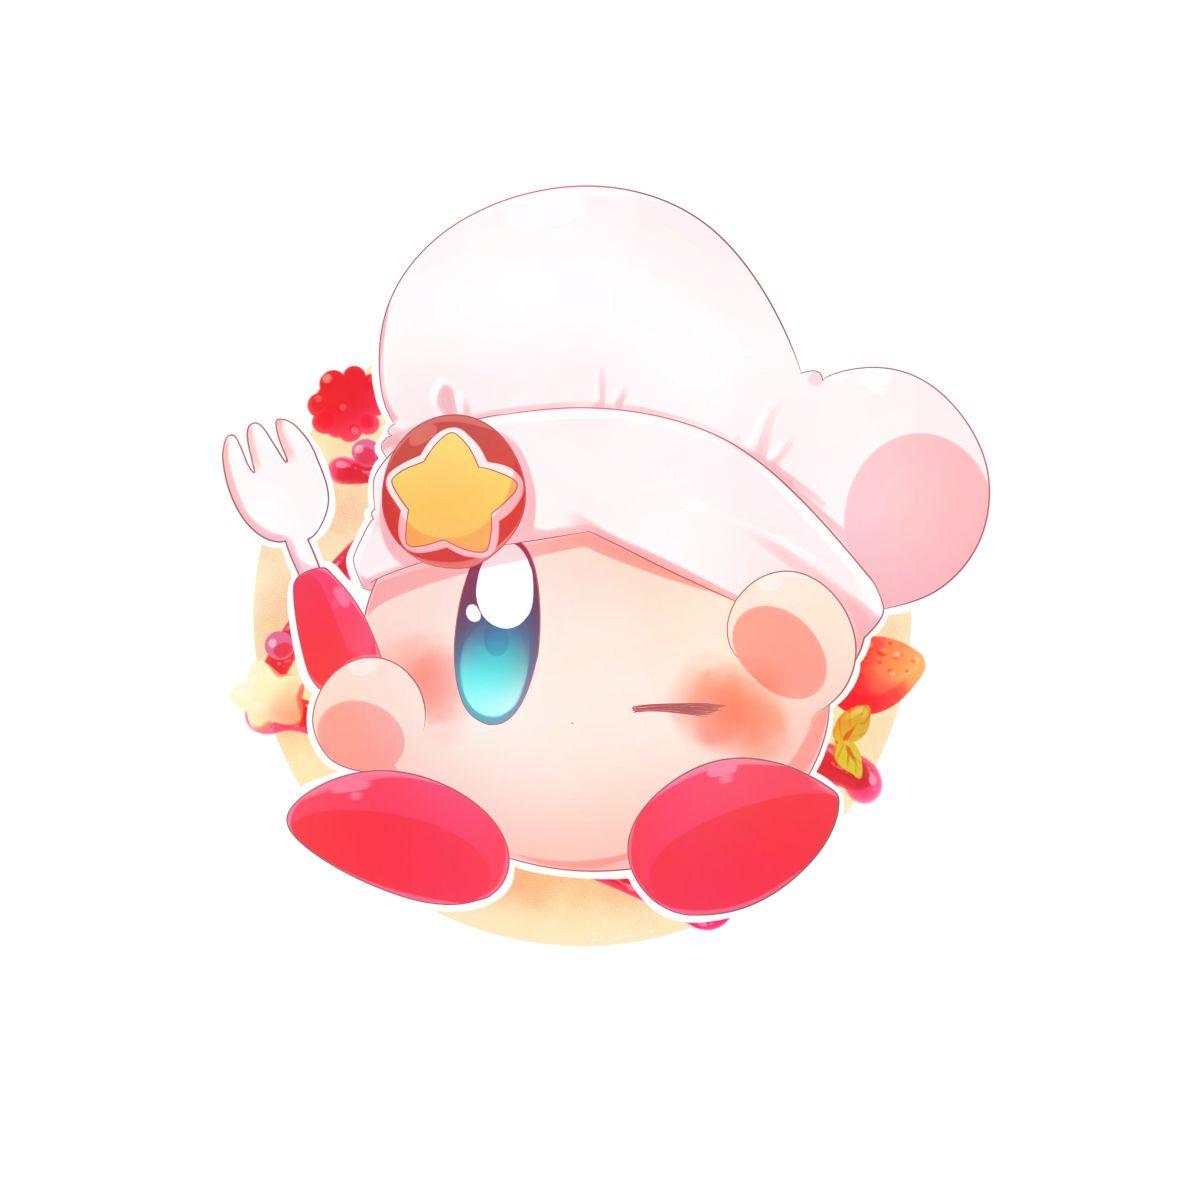 Create A Kirby Character Noll: Kirby Character, Meta Knight, Pokémon